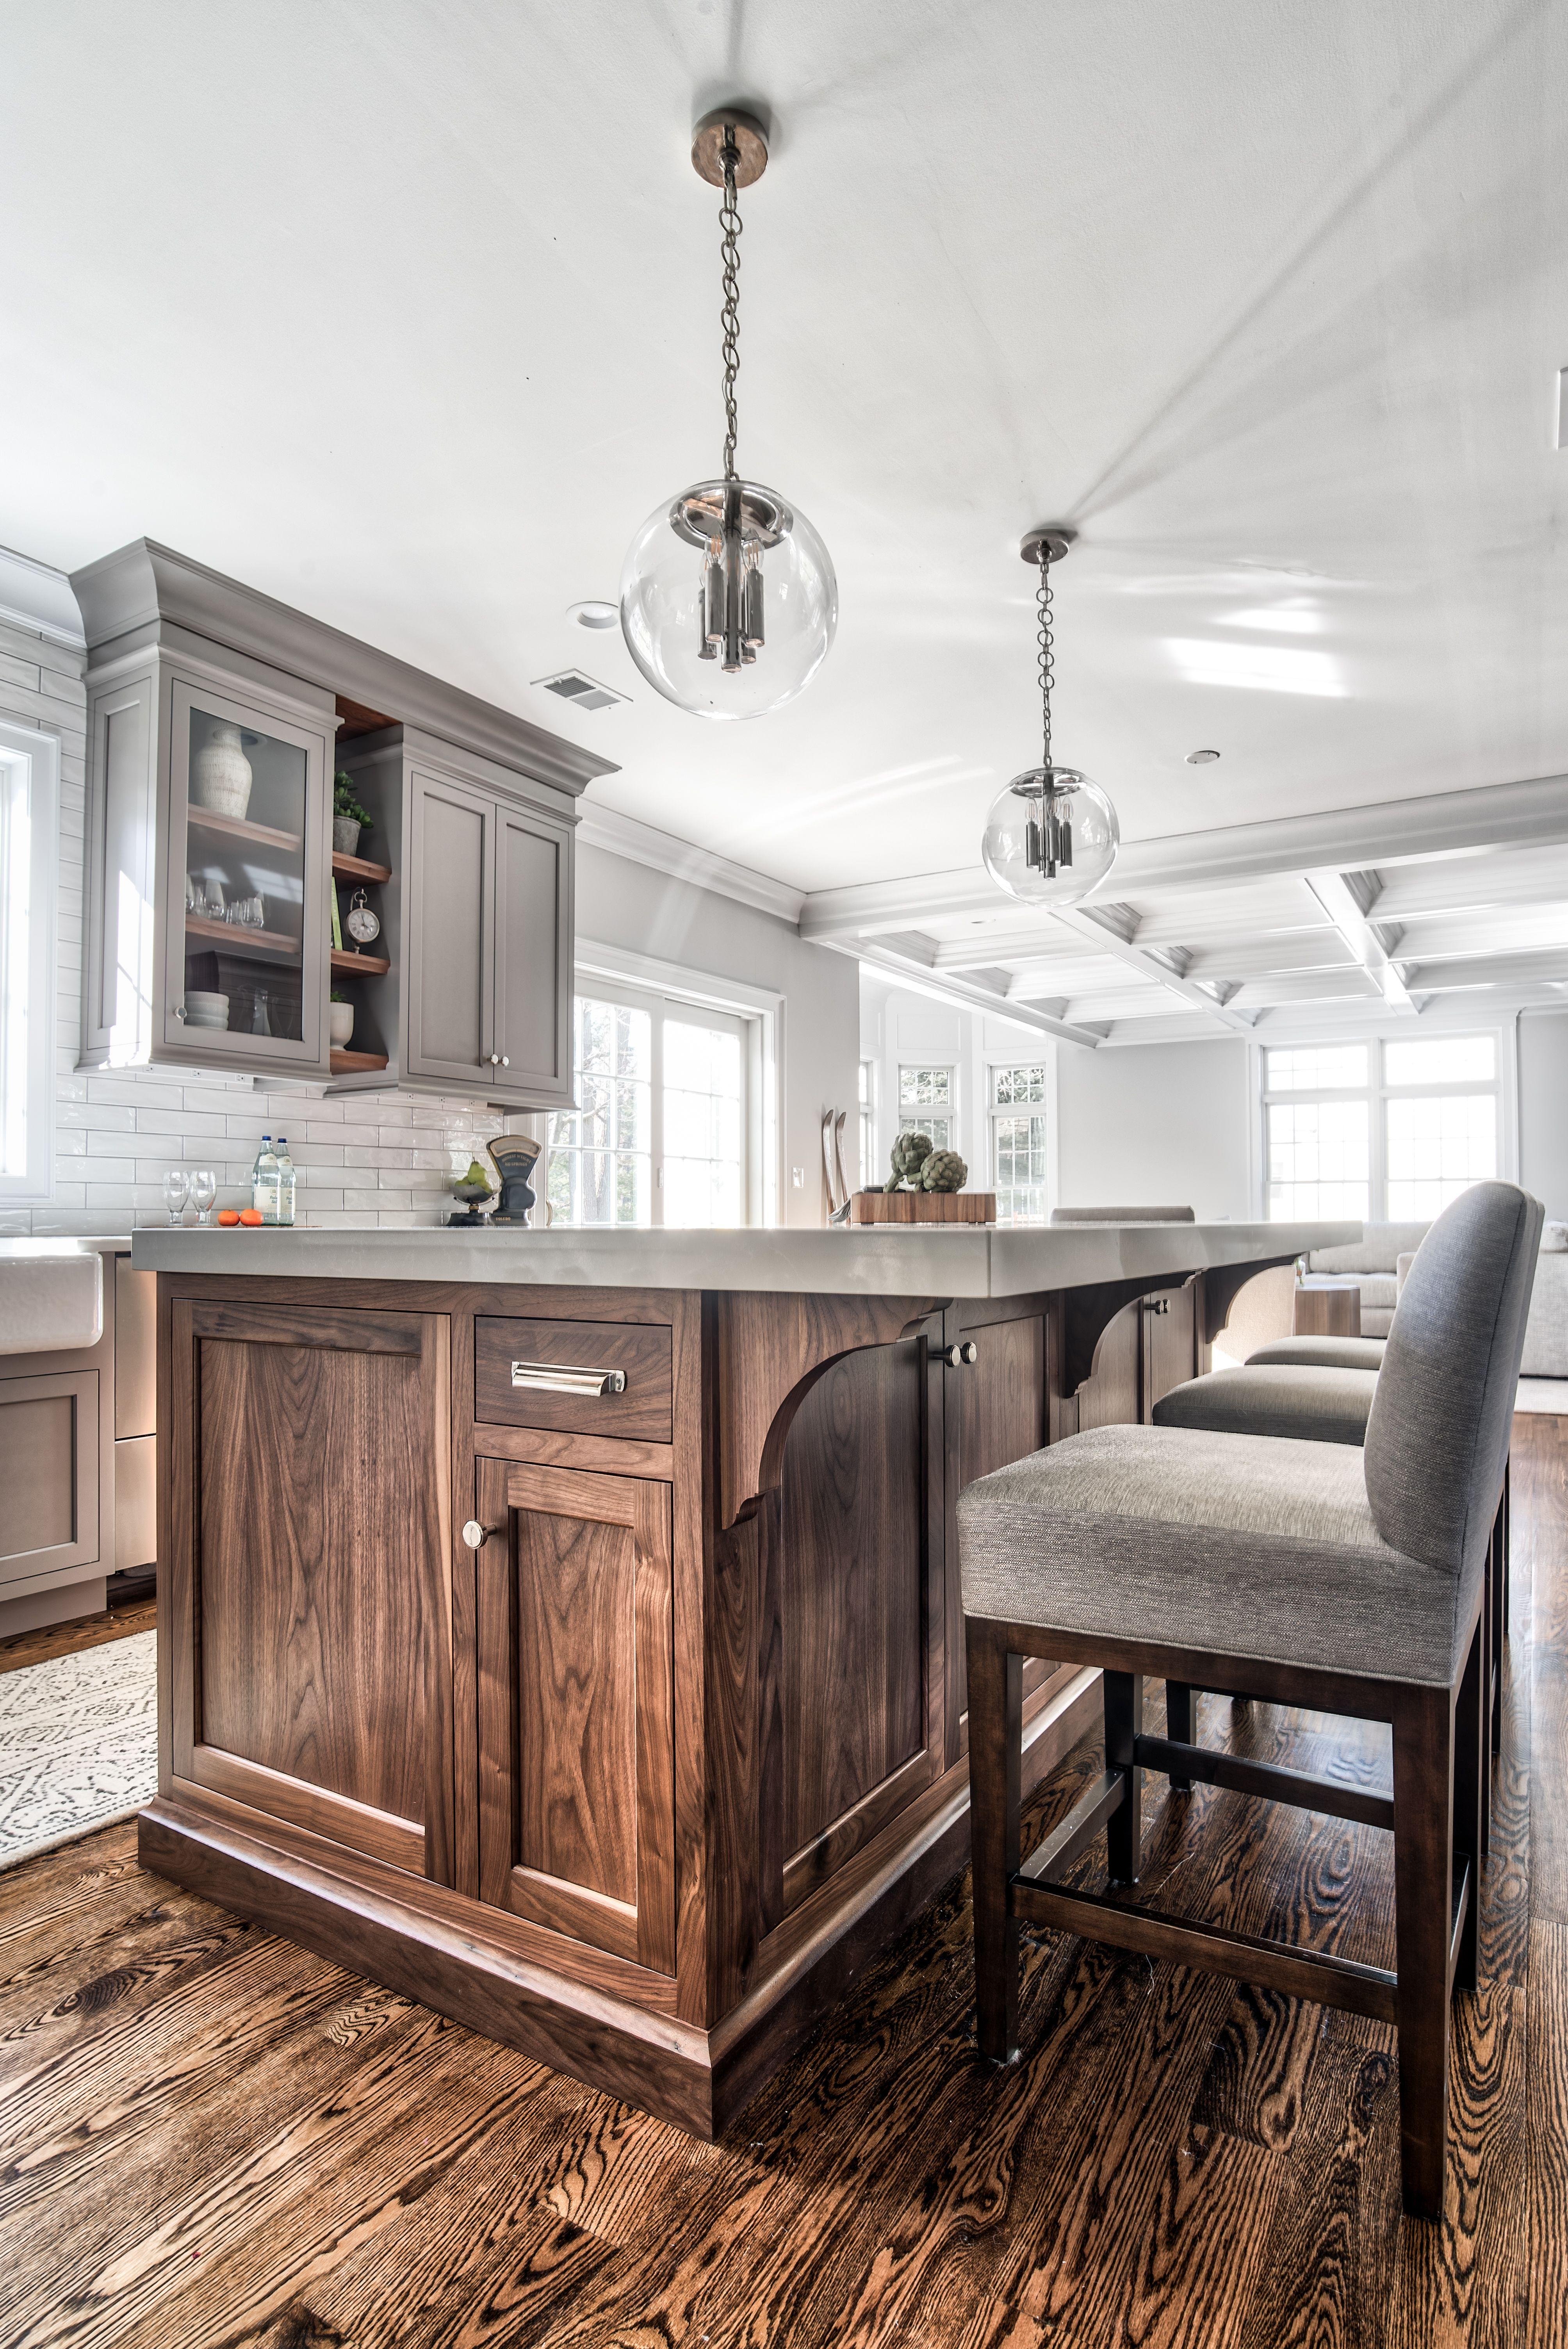 restoration hardware on natural walnut island kitchen remodel small grey kitchen designs on kitchen remodel must haves id=64955